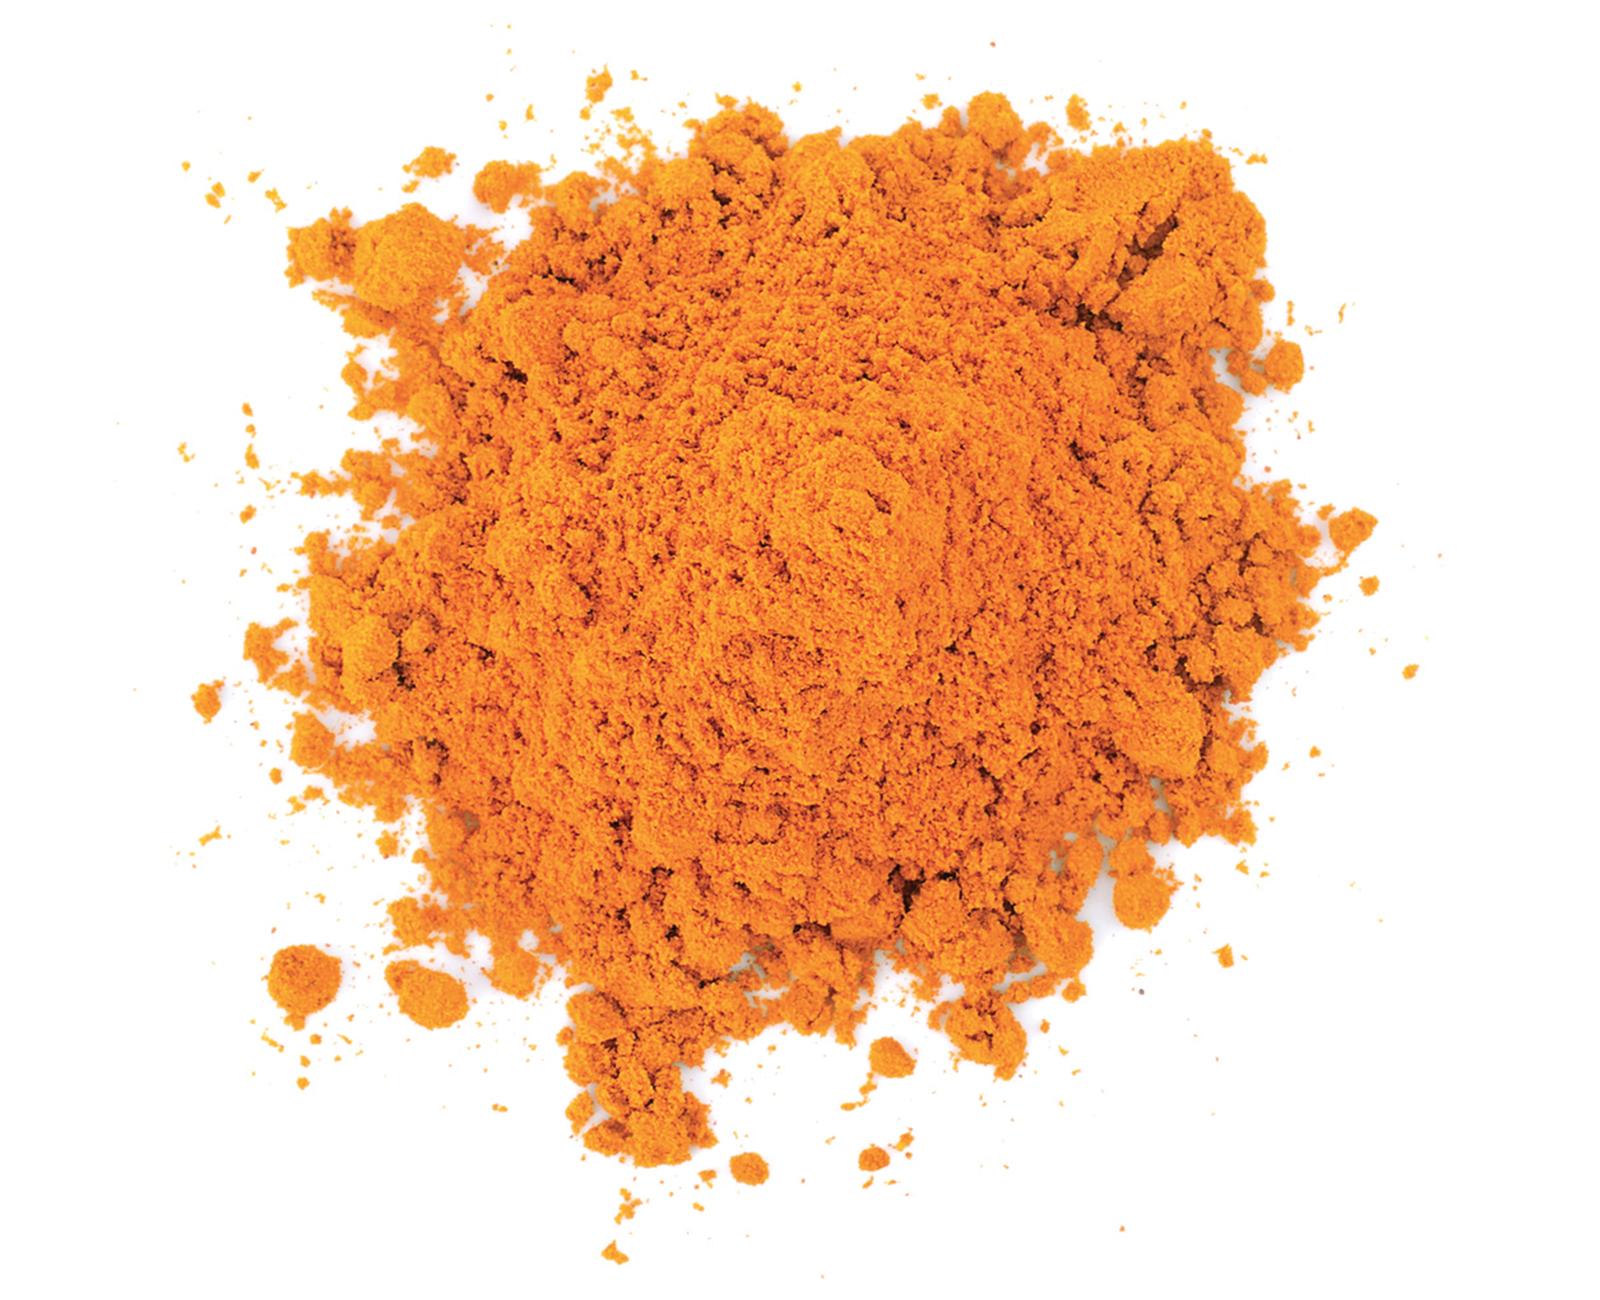 BETA CAROTÈNE - Beta-carotene